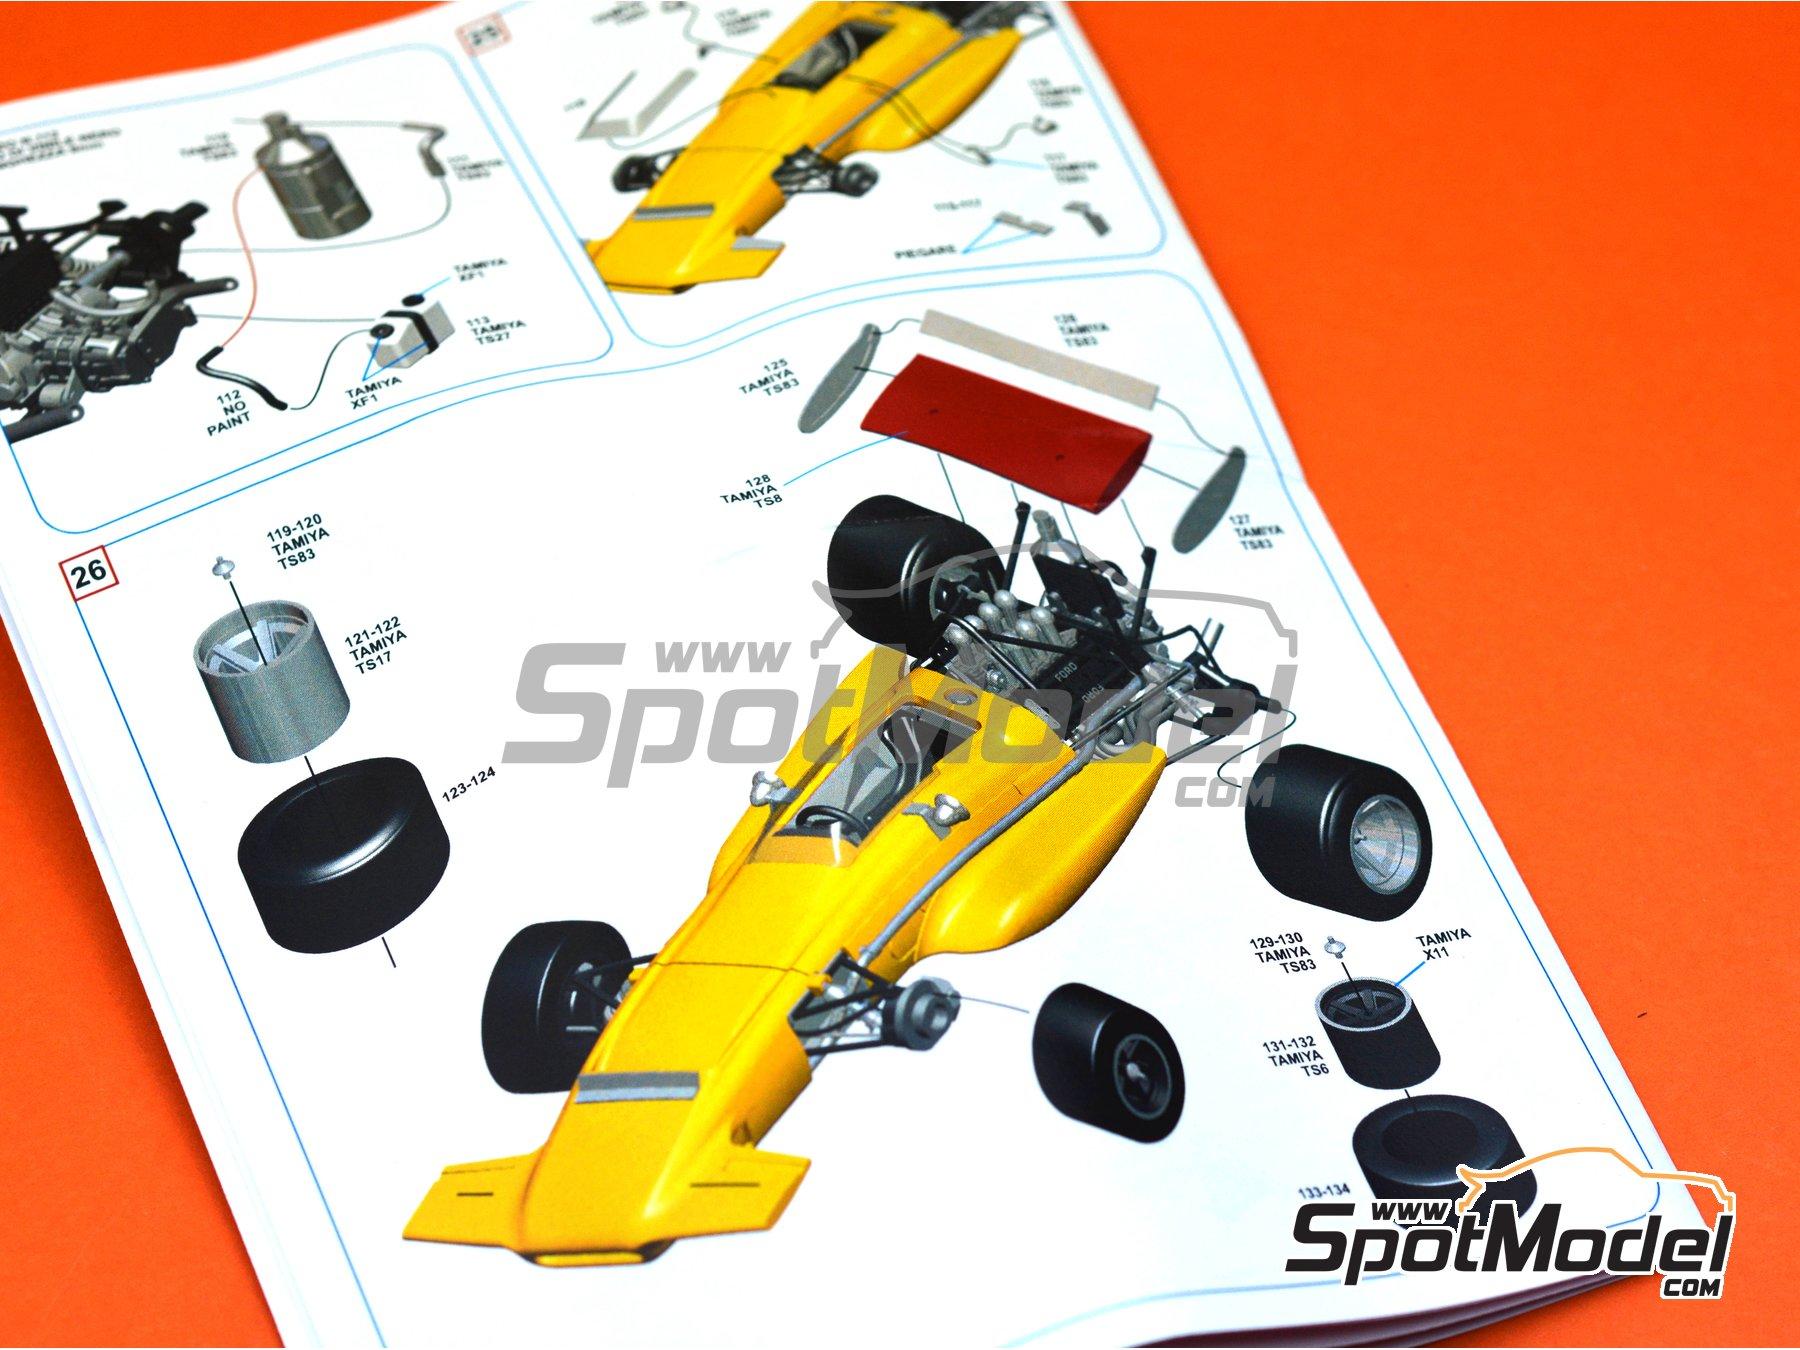 Image 11: March Ford 701 Antique Automobiles Ltd - Gran Premio de Formula 1 de Mónaco 1970 | Maqueta de coche en escala1/43 fabricado por Tameo Kits (ref.SLK102)